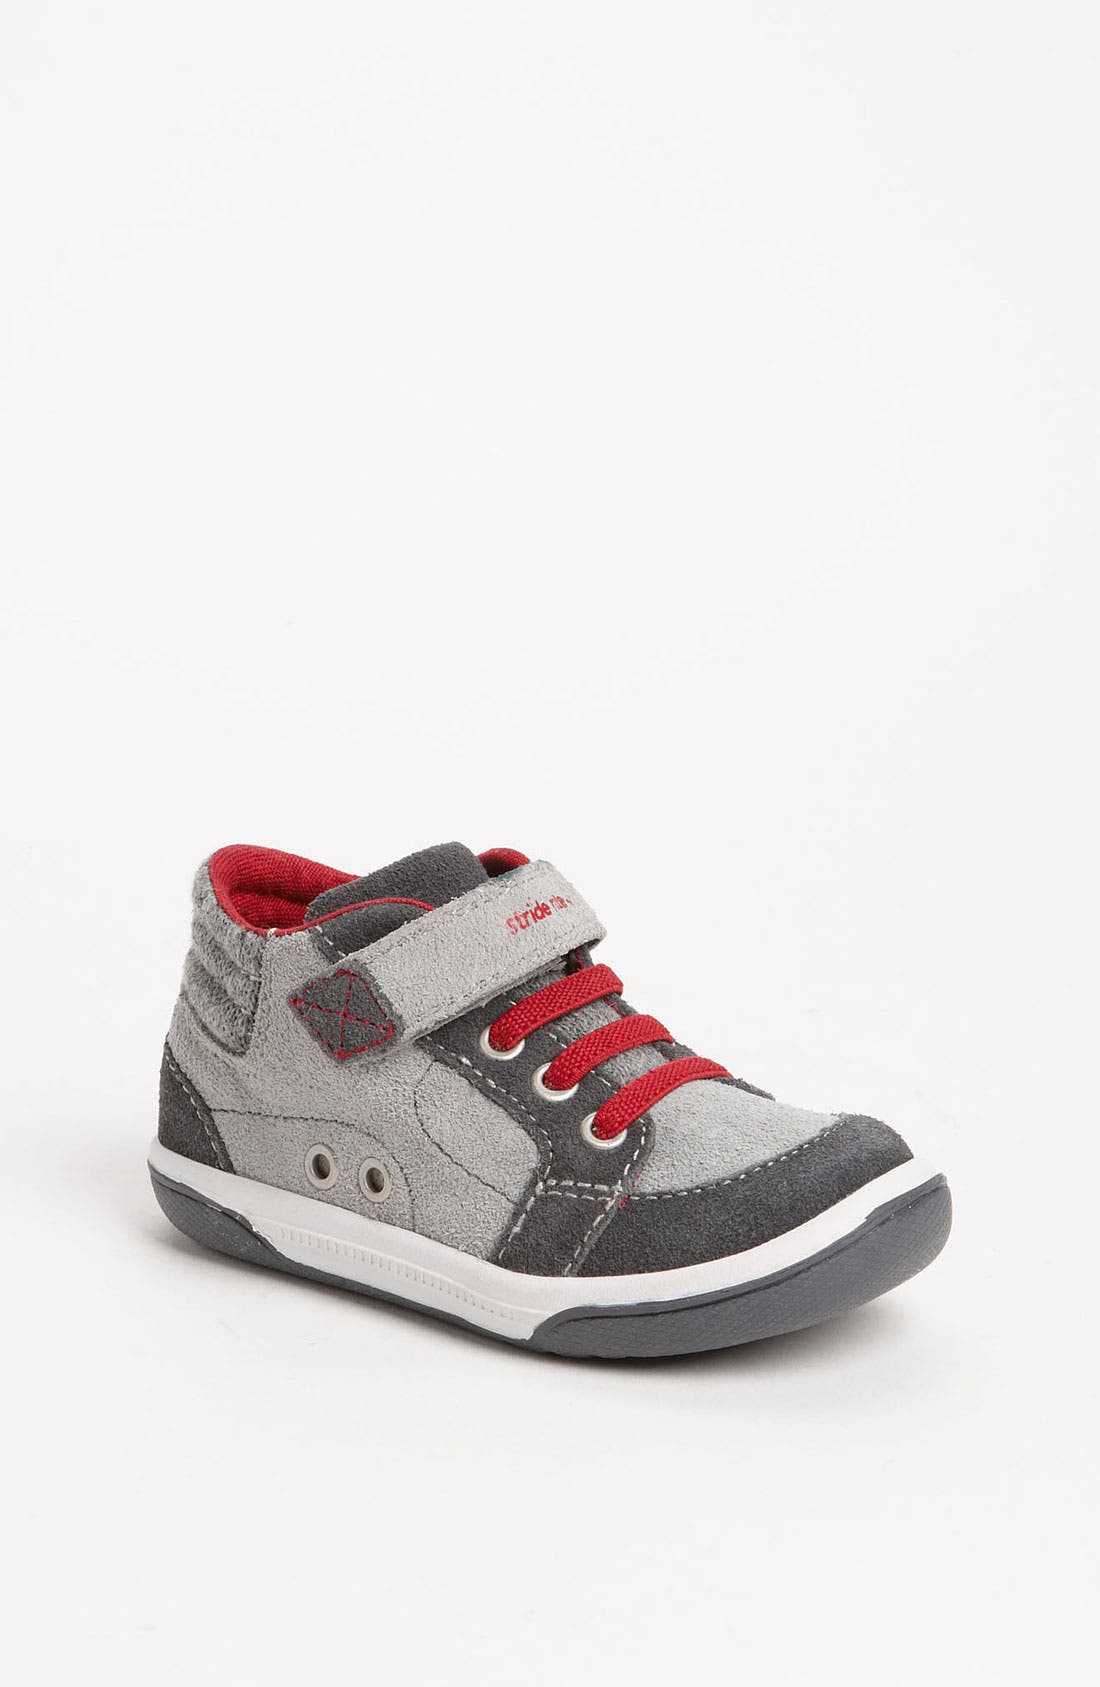 Alternate Image 1 Selected - Stride Rite 'Heath' Sneaker (Baby, Walker & Toddler)